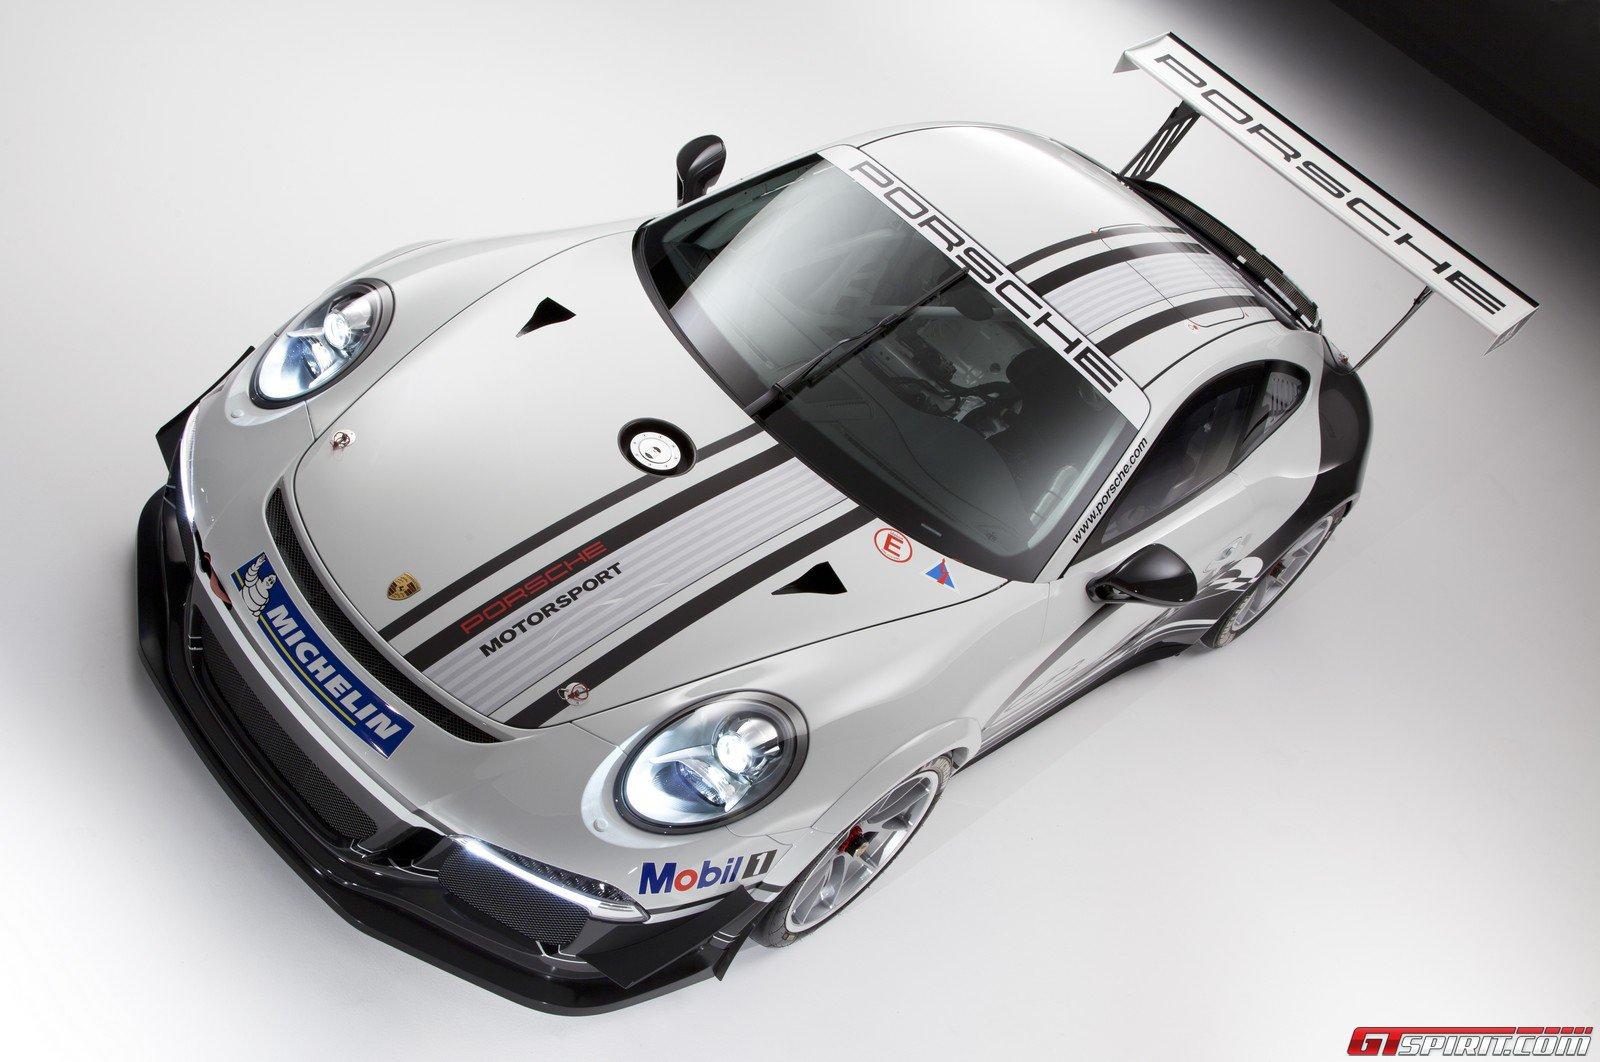 2013 Porsche 911 GT3 Cup Photo 1